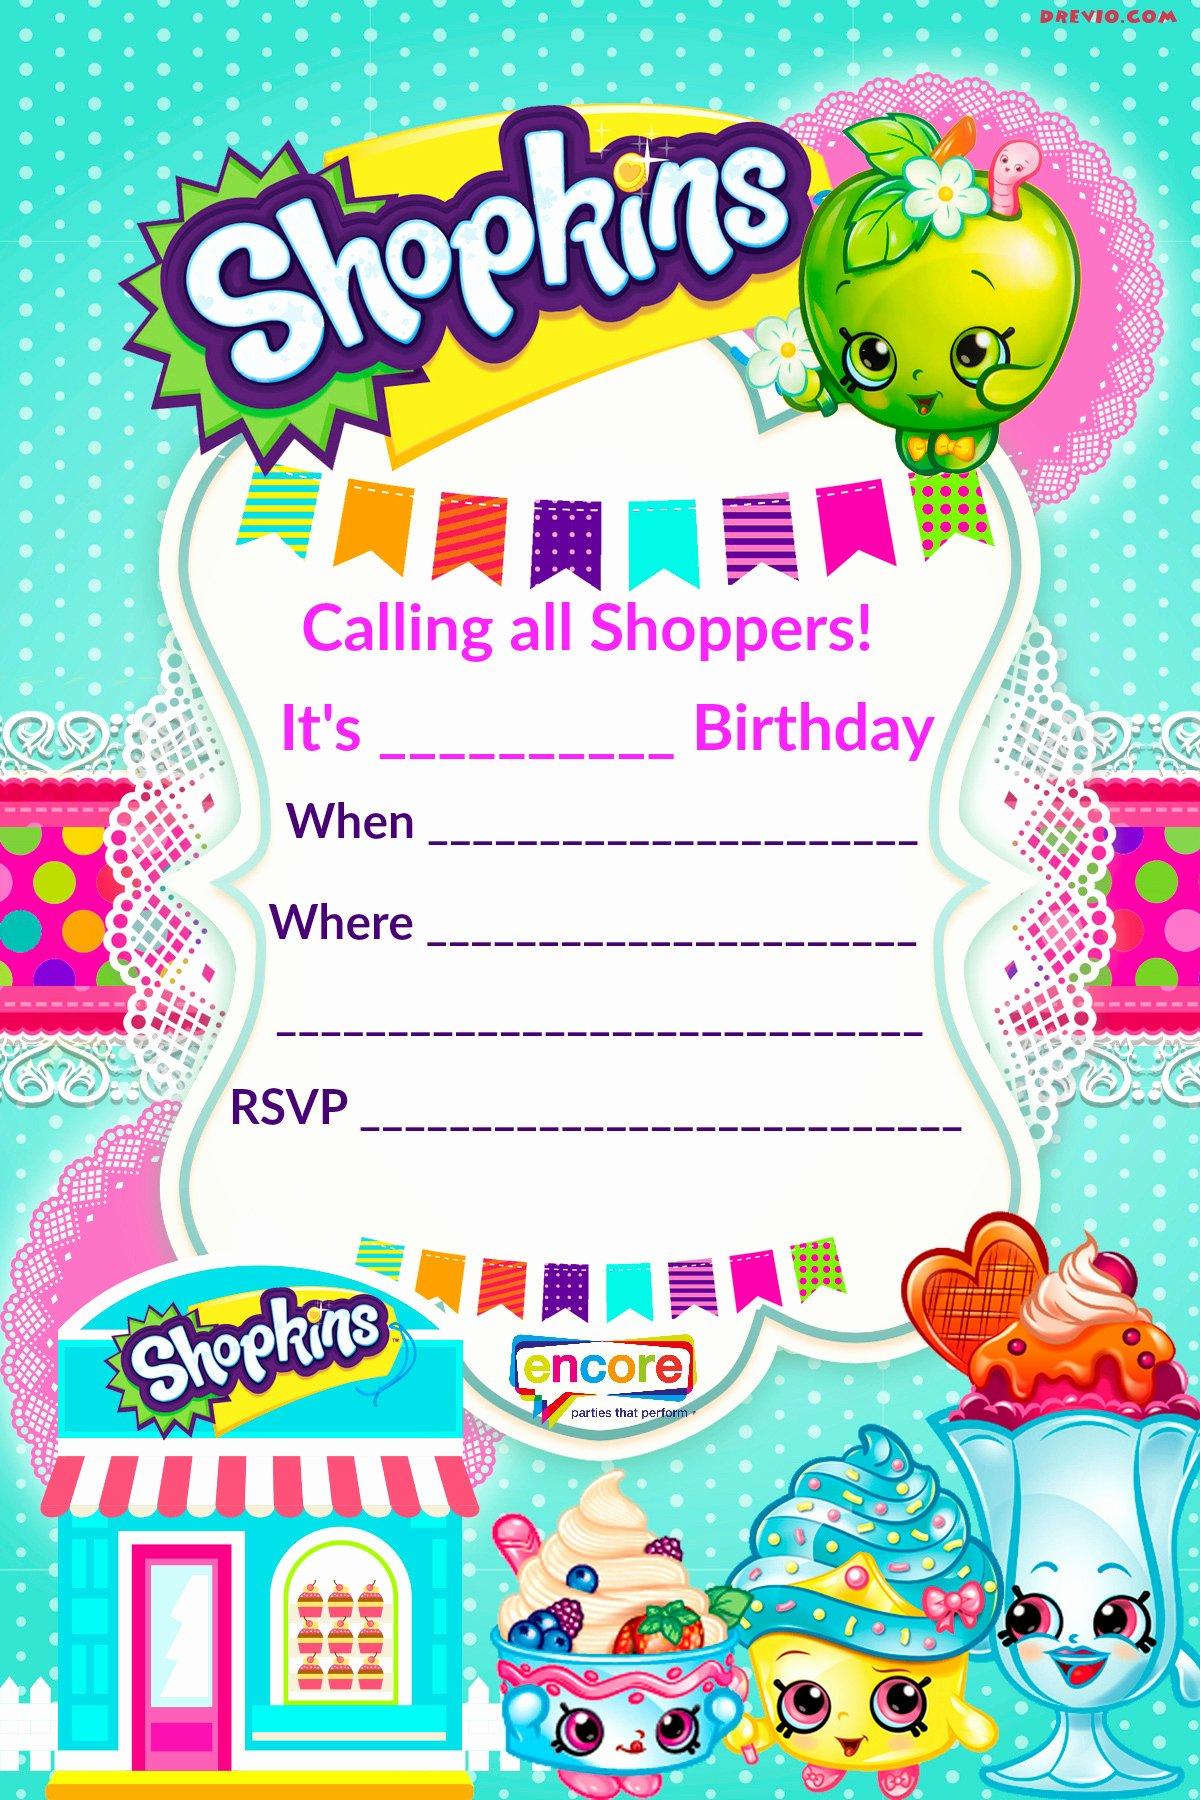 Free Printable Birthday Invitation Templates Luxury Updated – Free Printable Shopkins Birthday Invitation